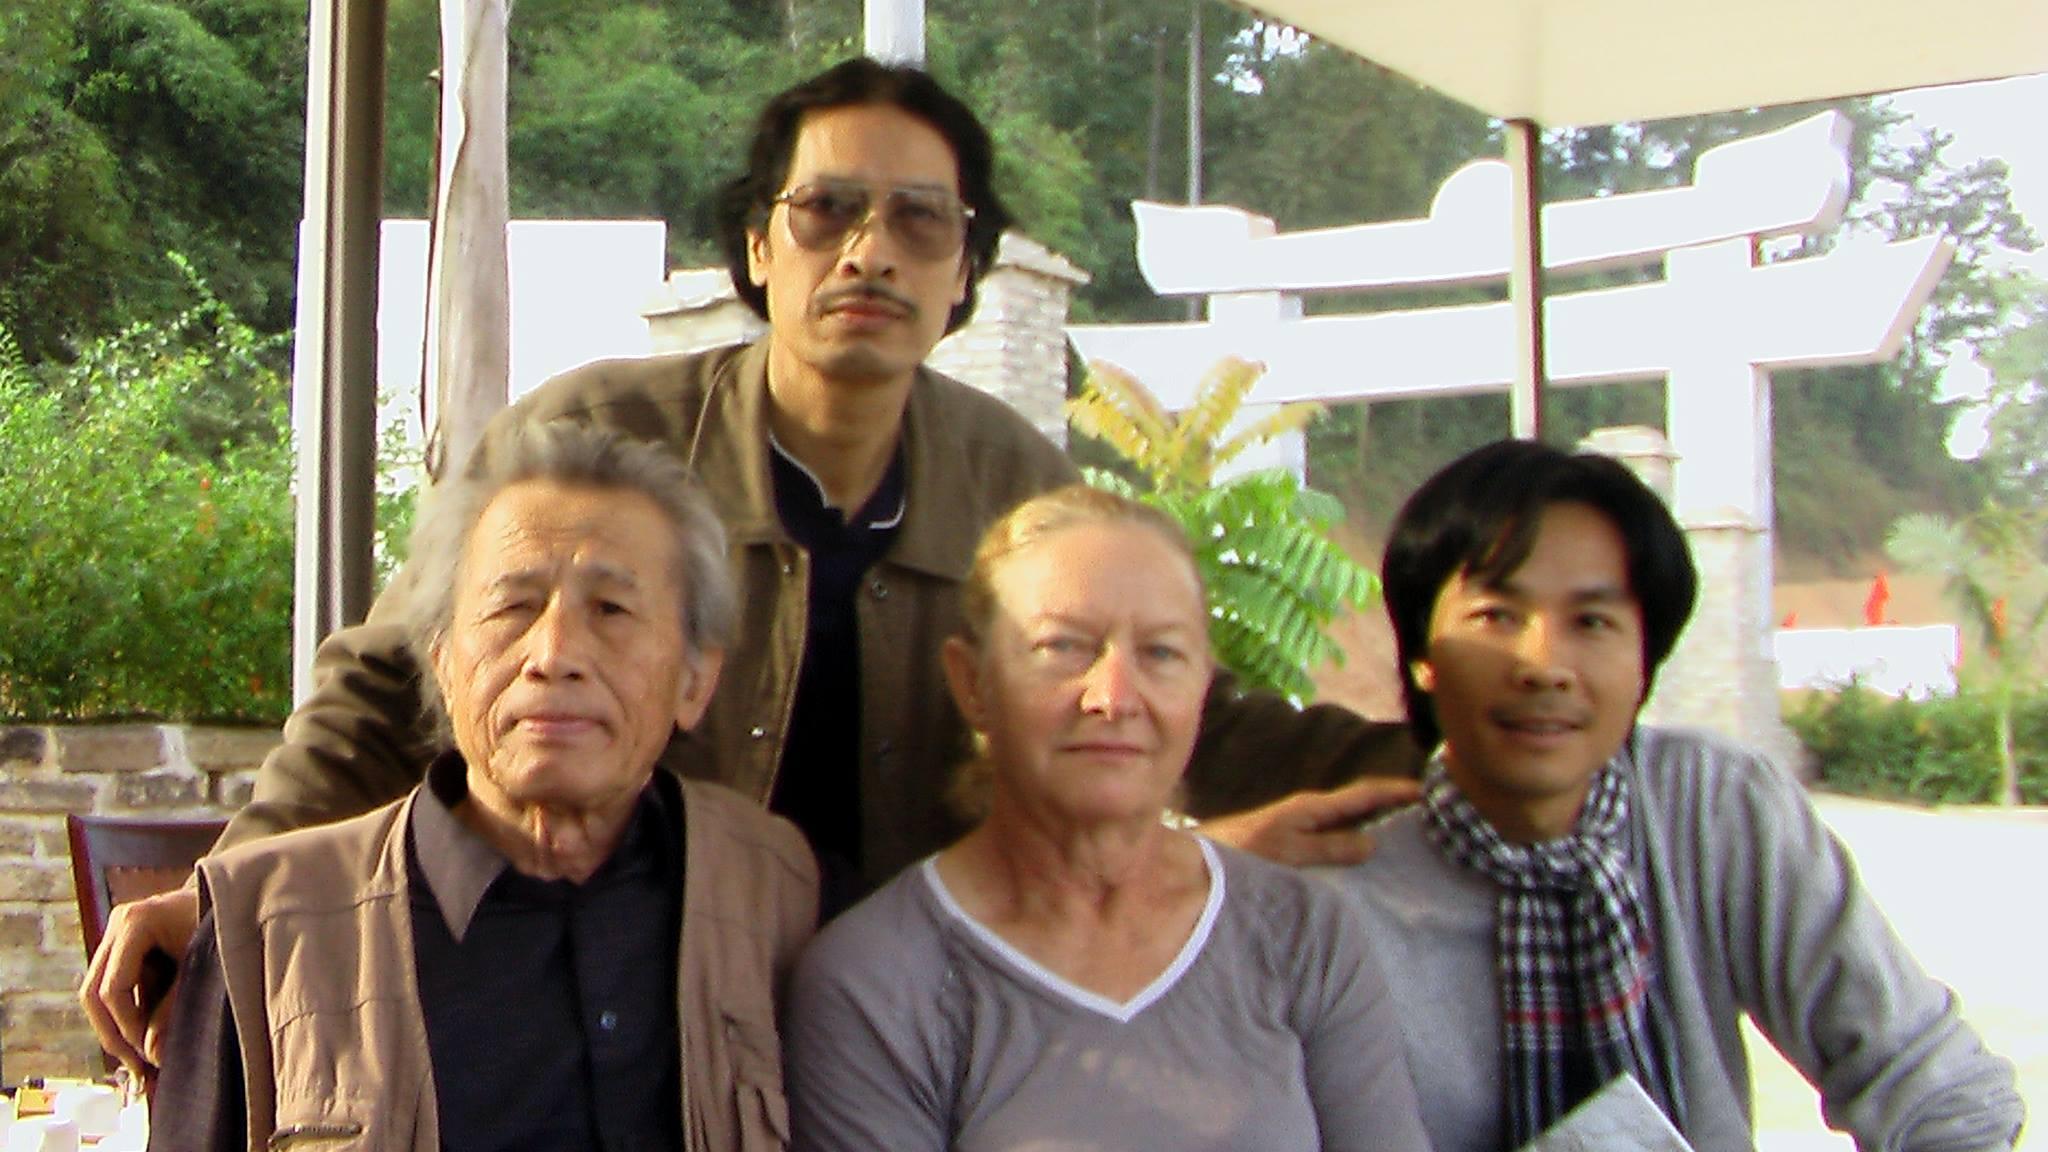 2009 Camp of International Sculpture, Phu Tho province, Vietnam